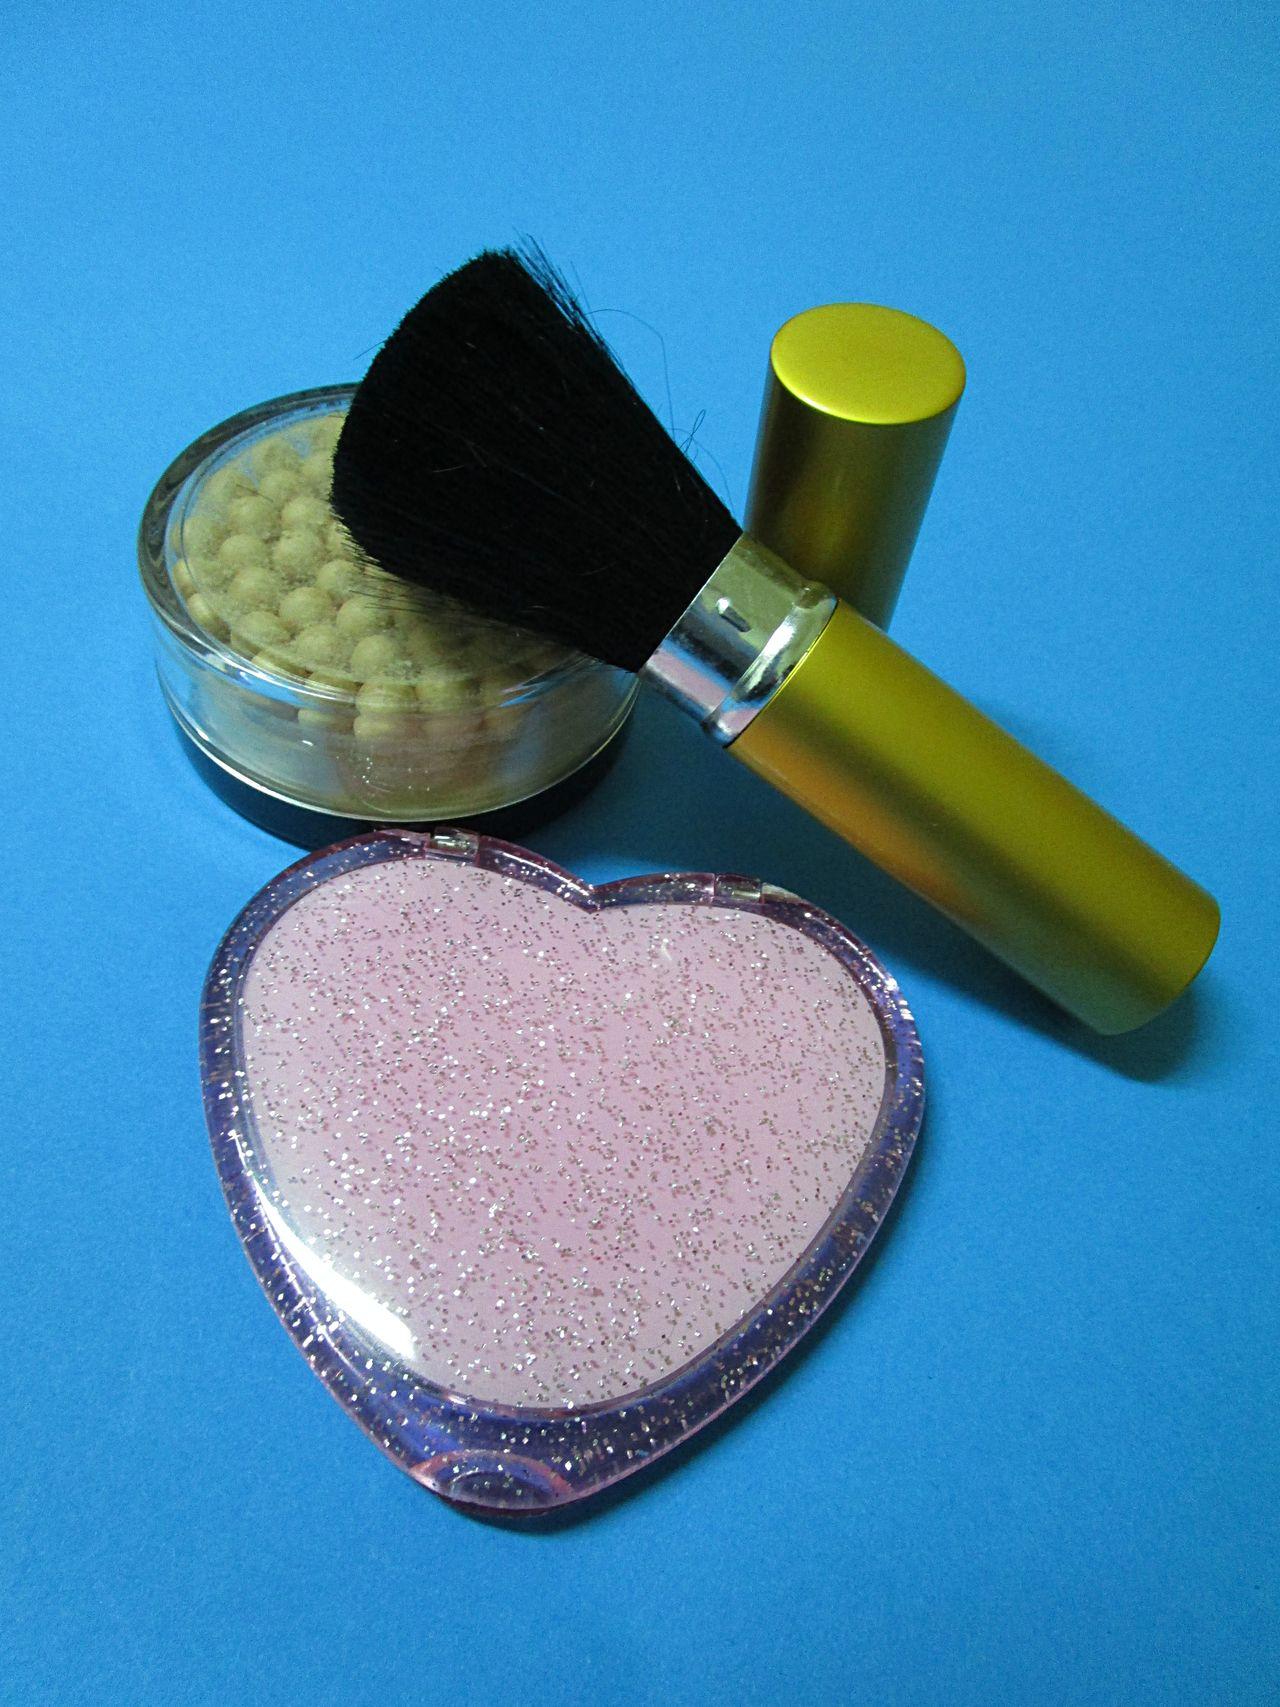 Blush Brush EyeEm Best Shots EyeEmBestPics Makeup Makeupaddict Mirror Portugal Powder Sparkle